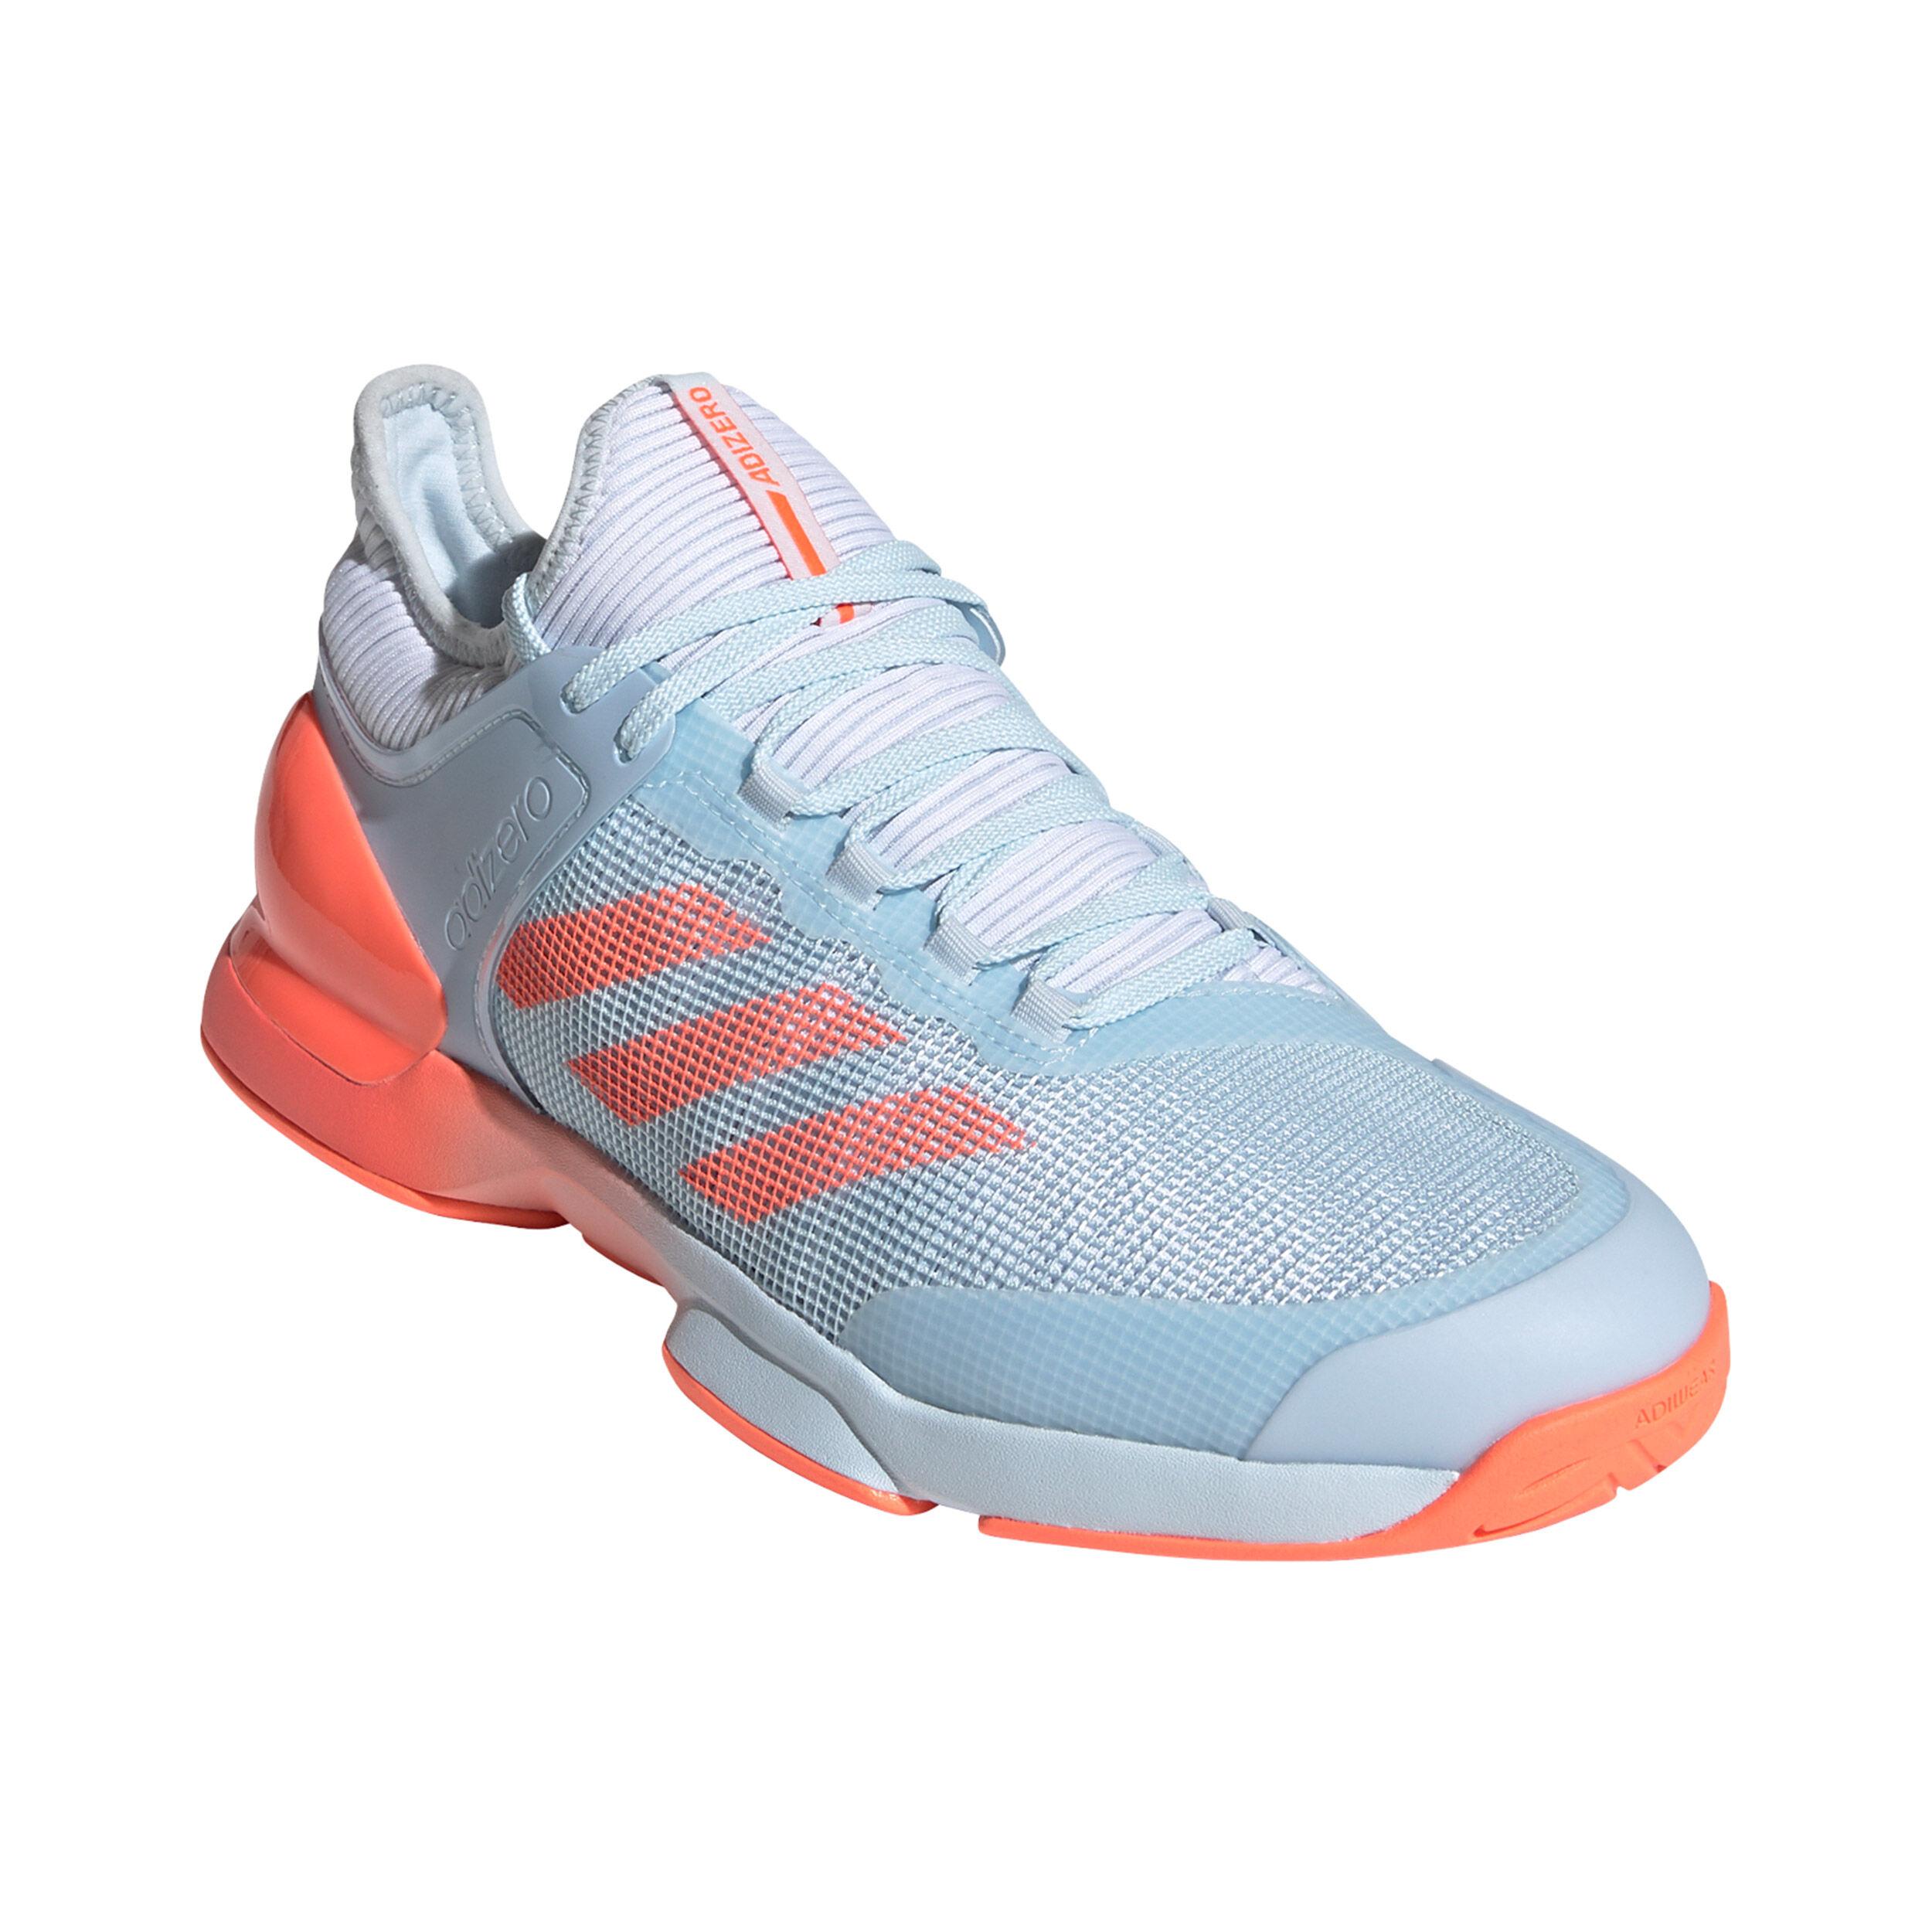 adidas Adizero Ubersonic 2 Allcourt Schoen Heren